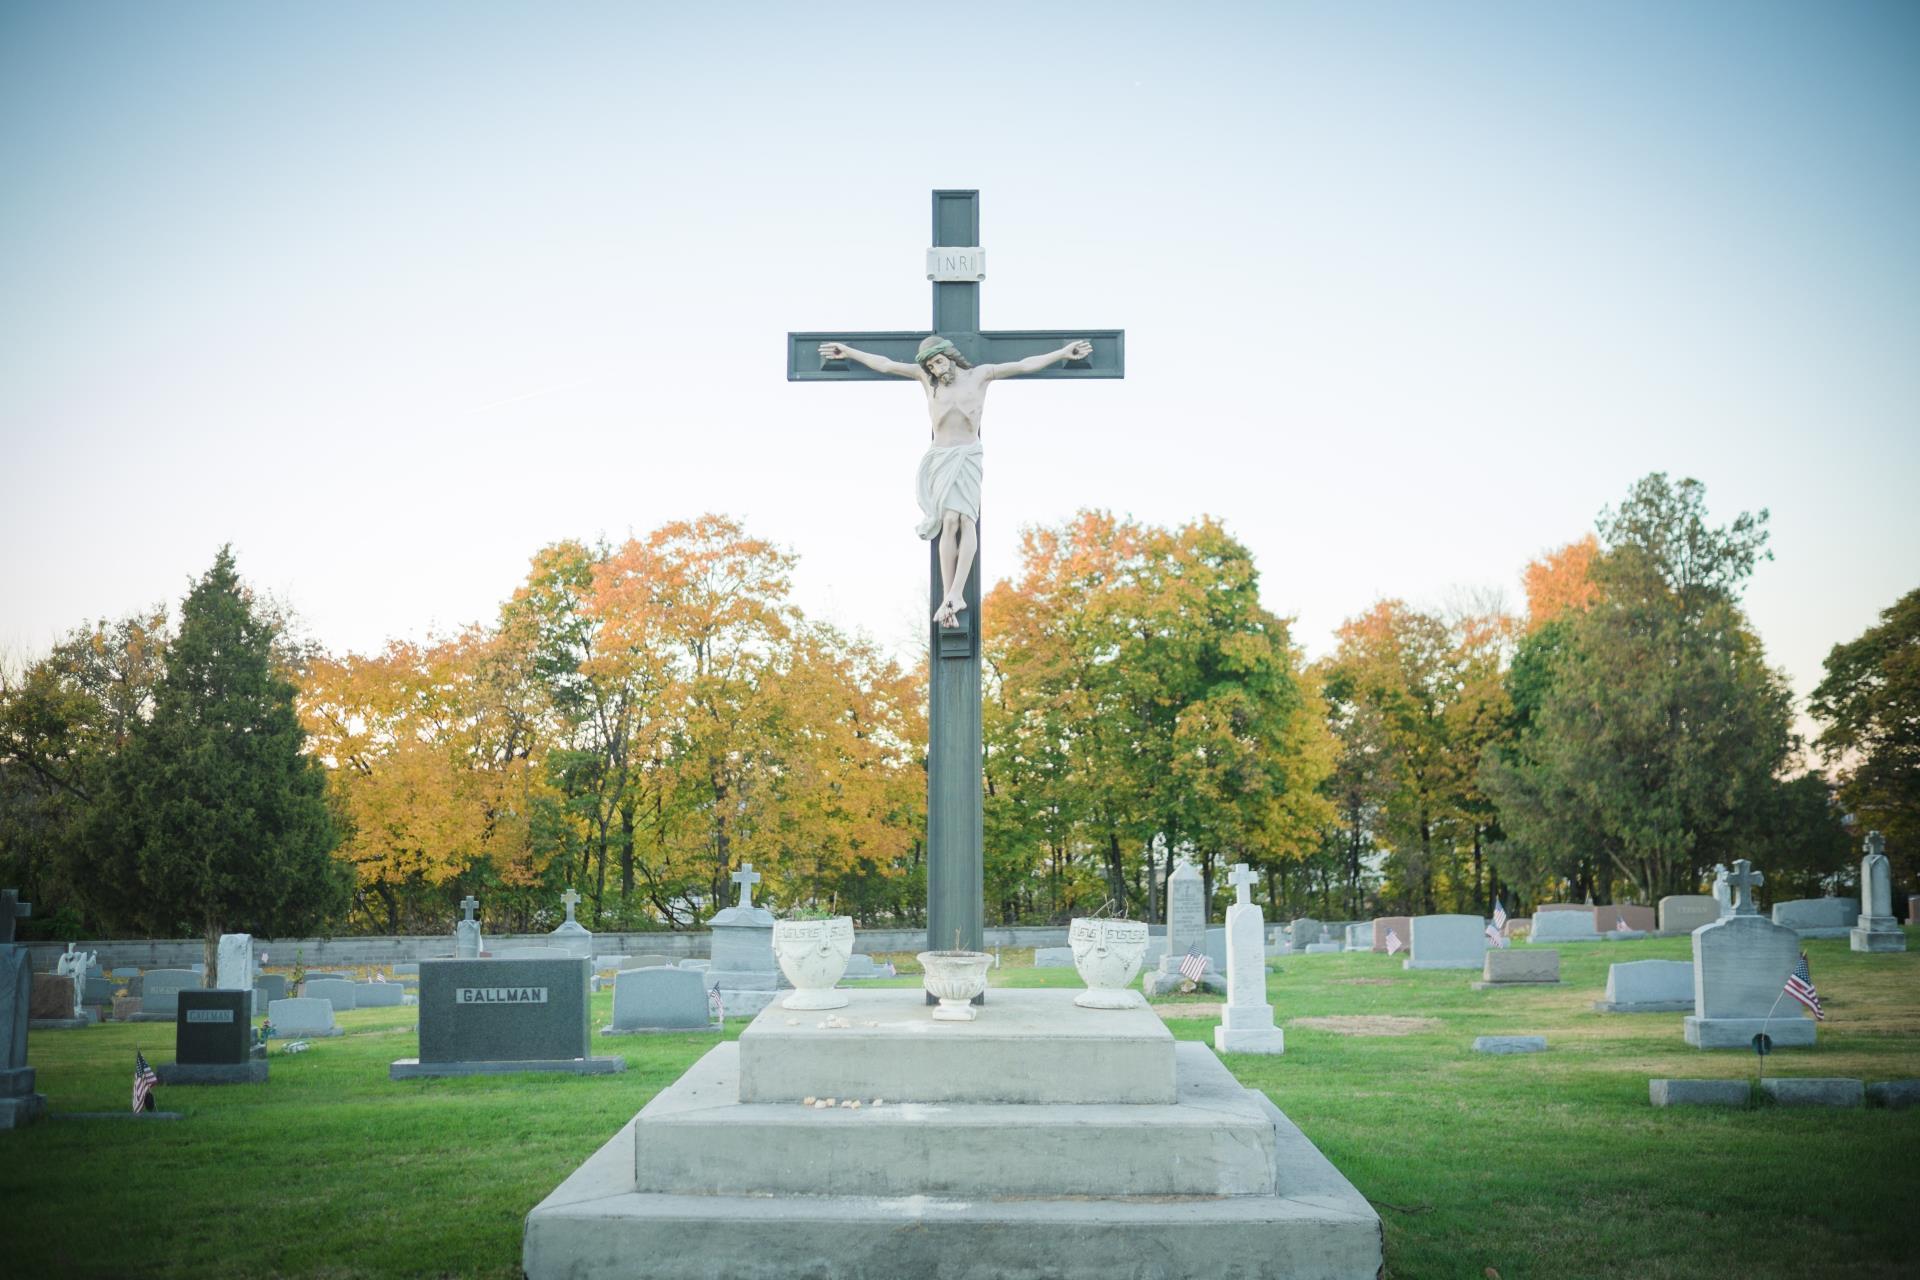 St Marys Crucifix